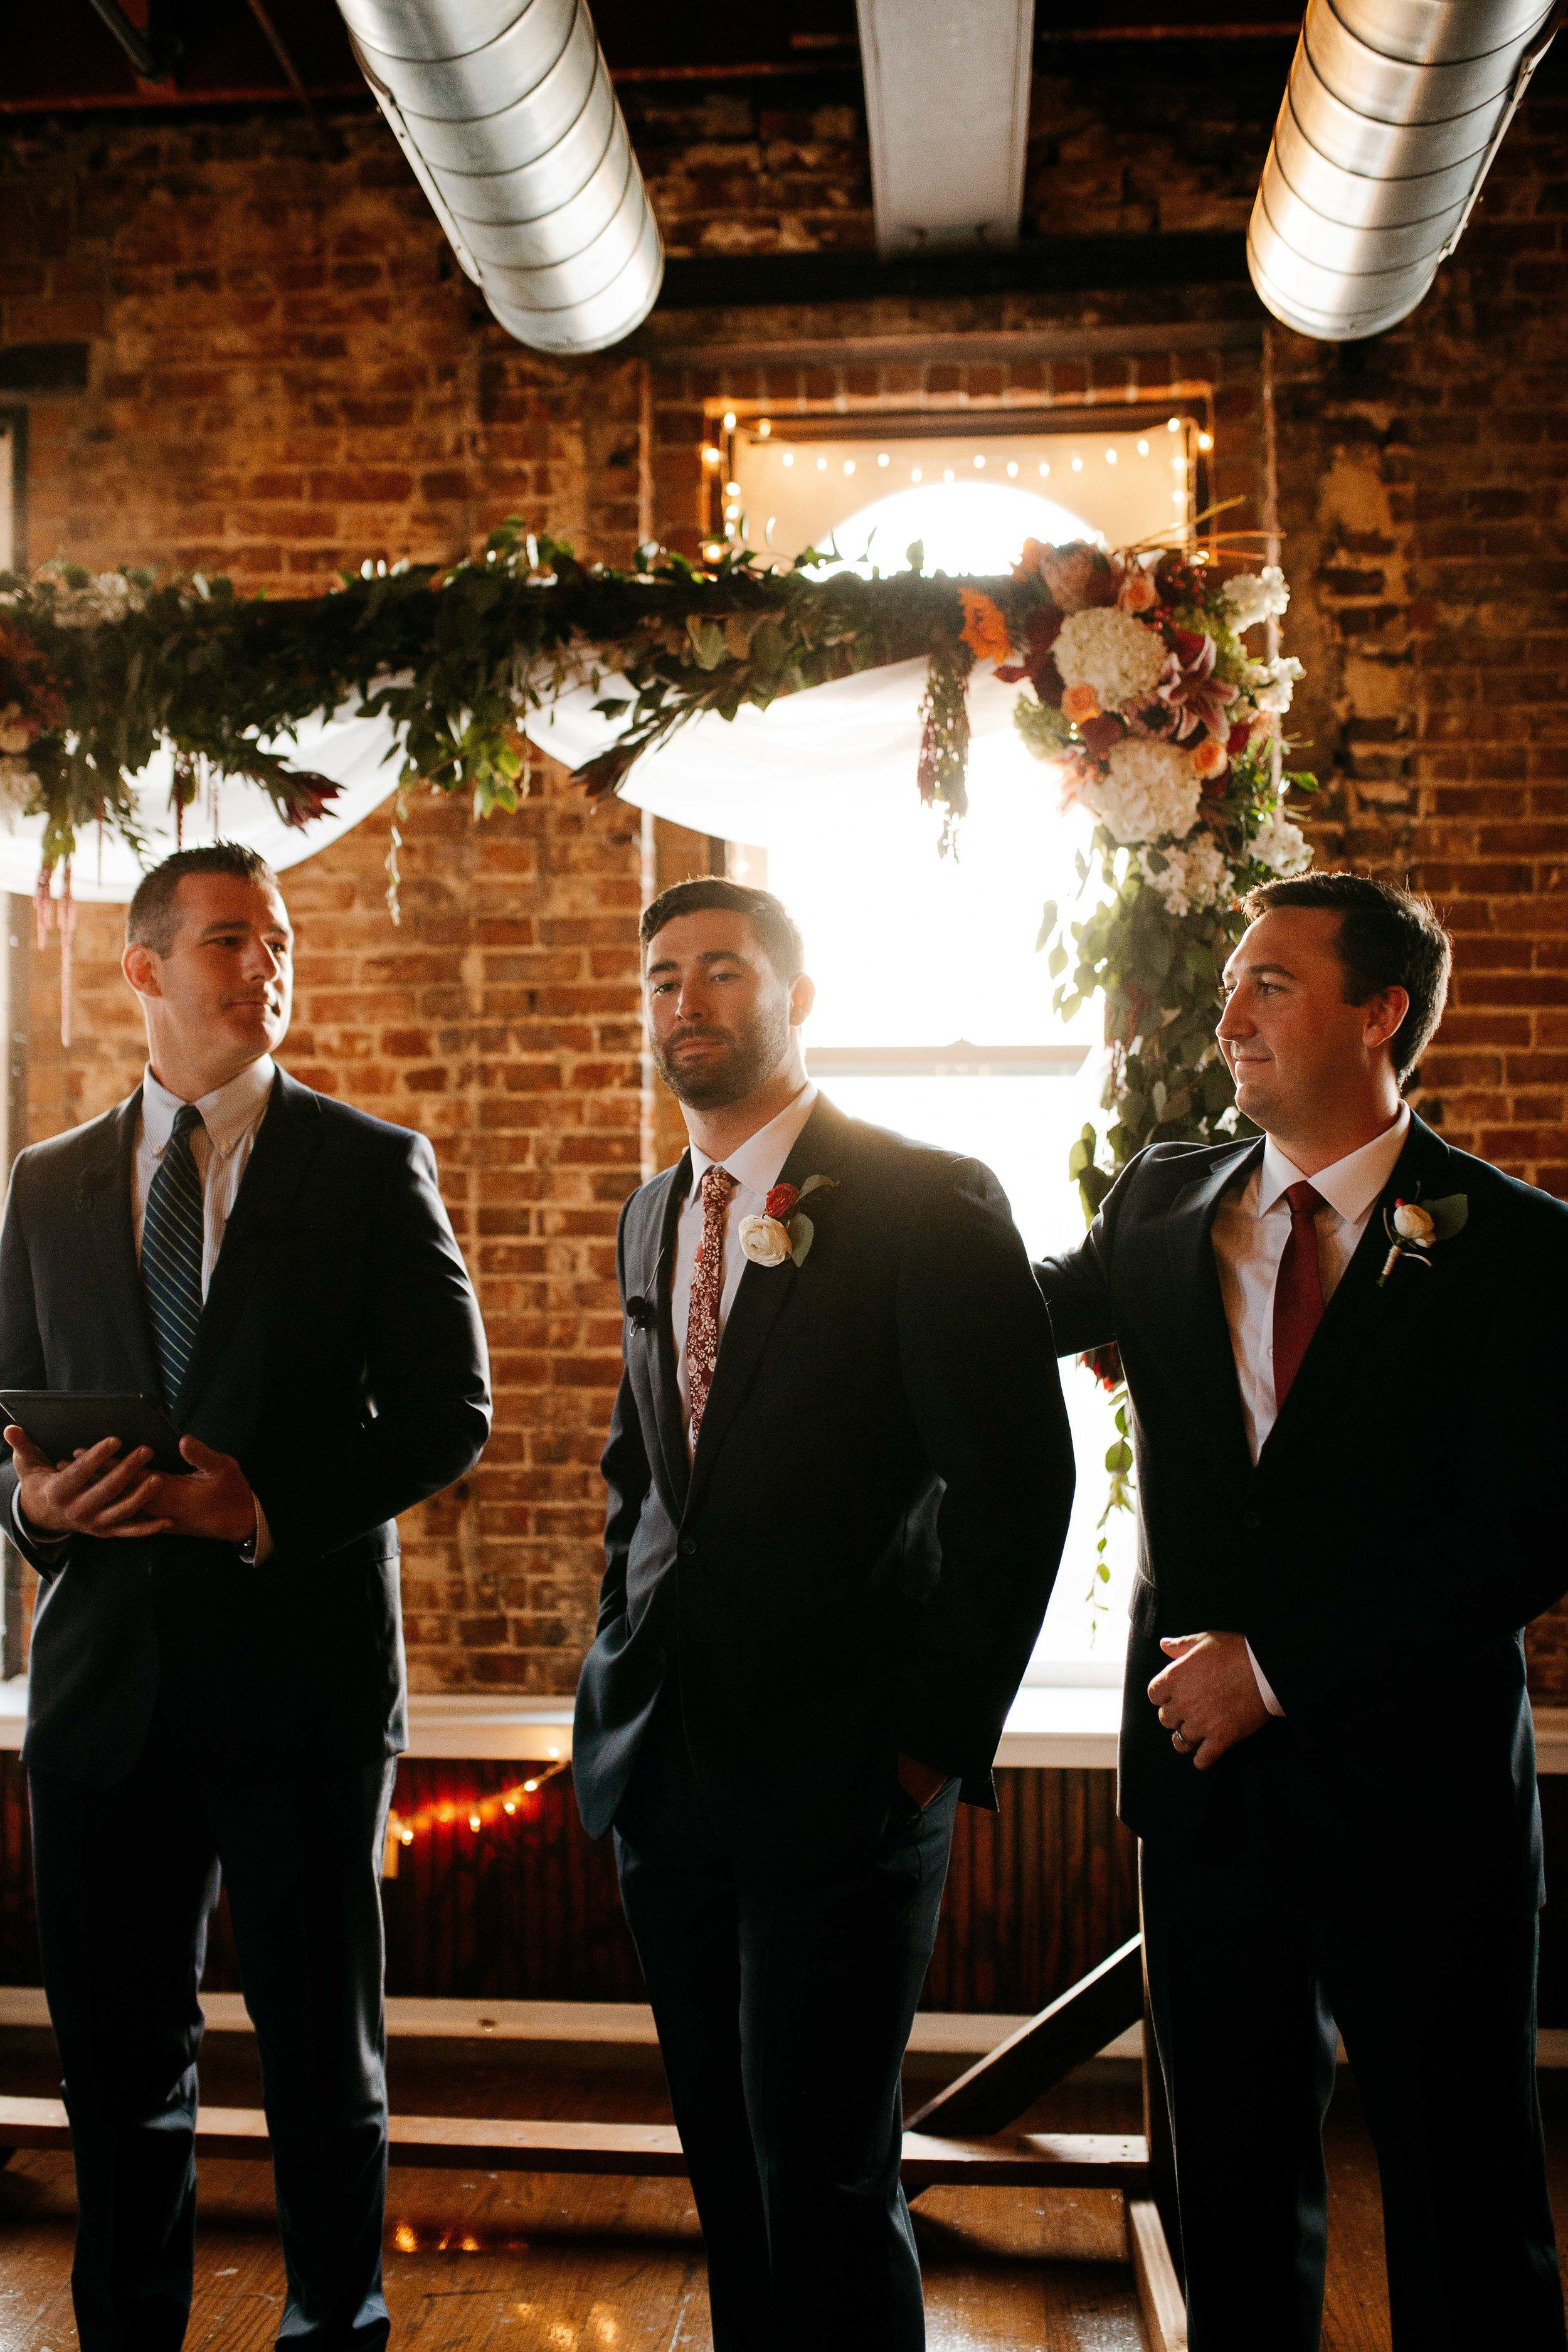 memphis tn wedding-76.jpg